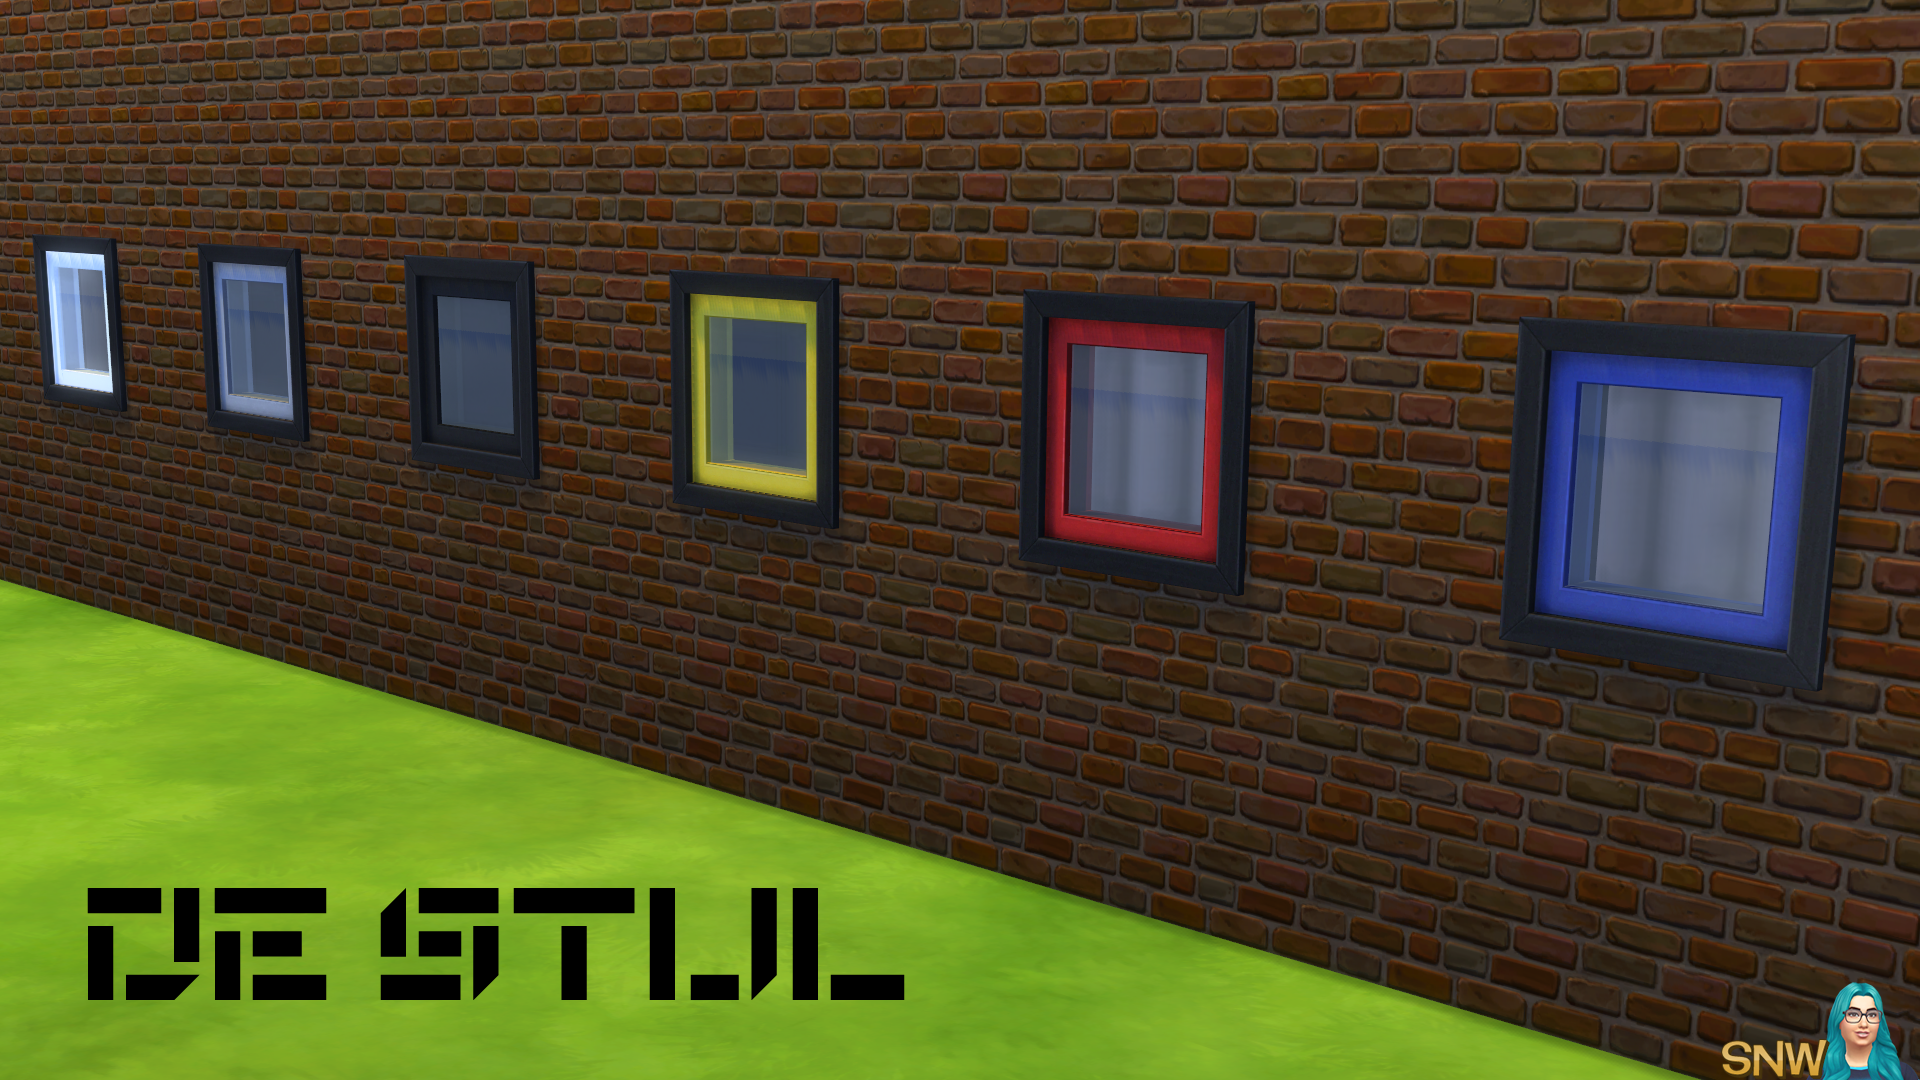 De Stijl Square Window 6 Snw Simsnetwork Com